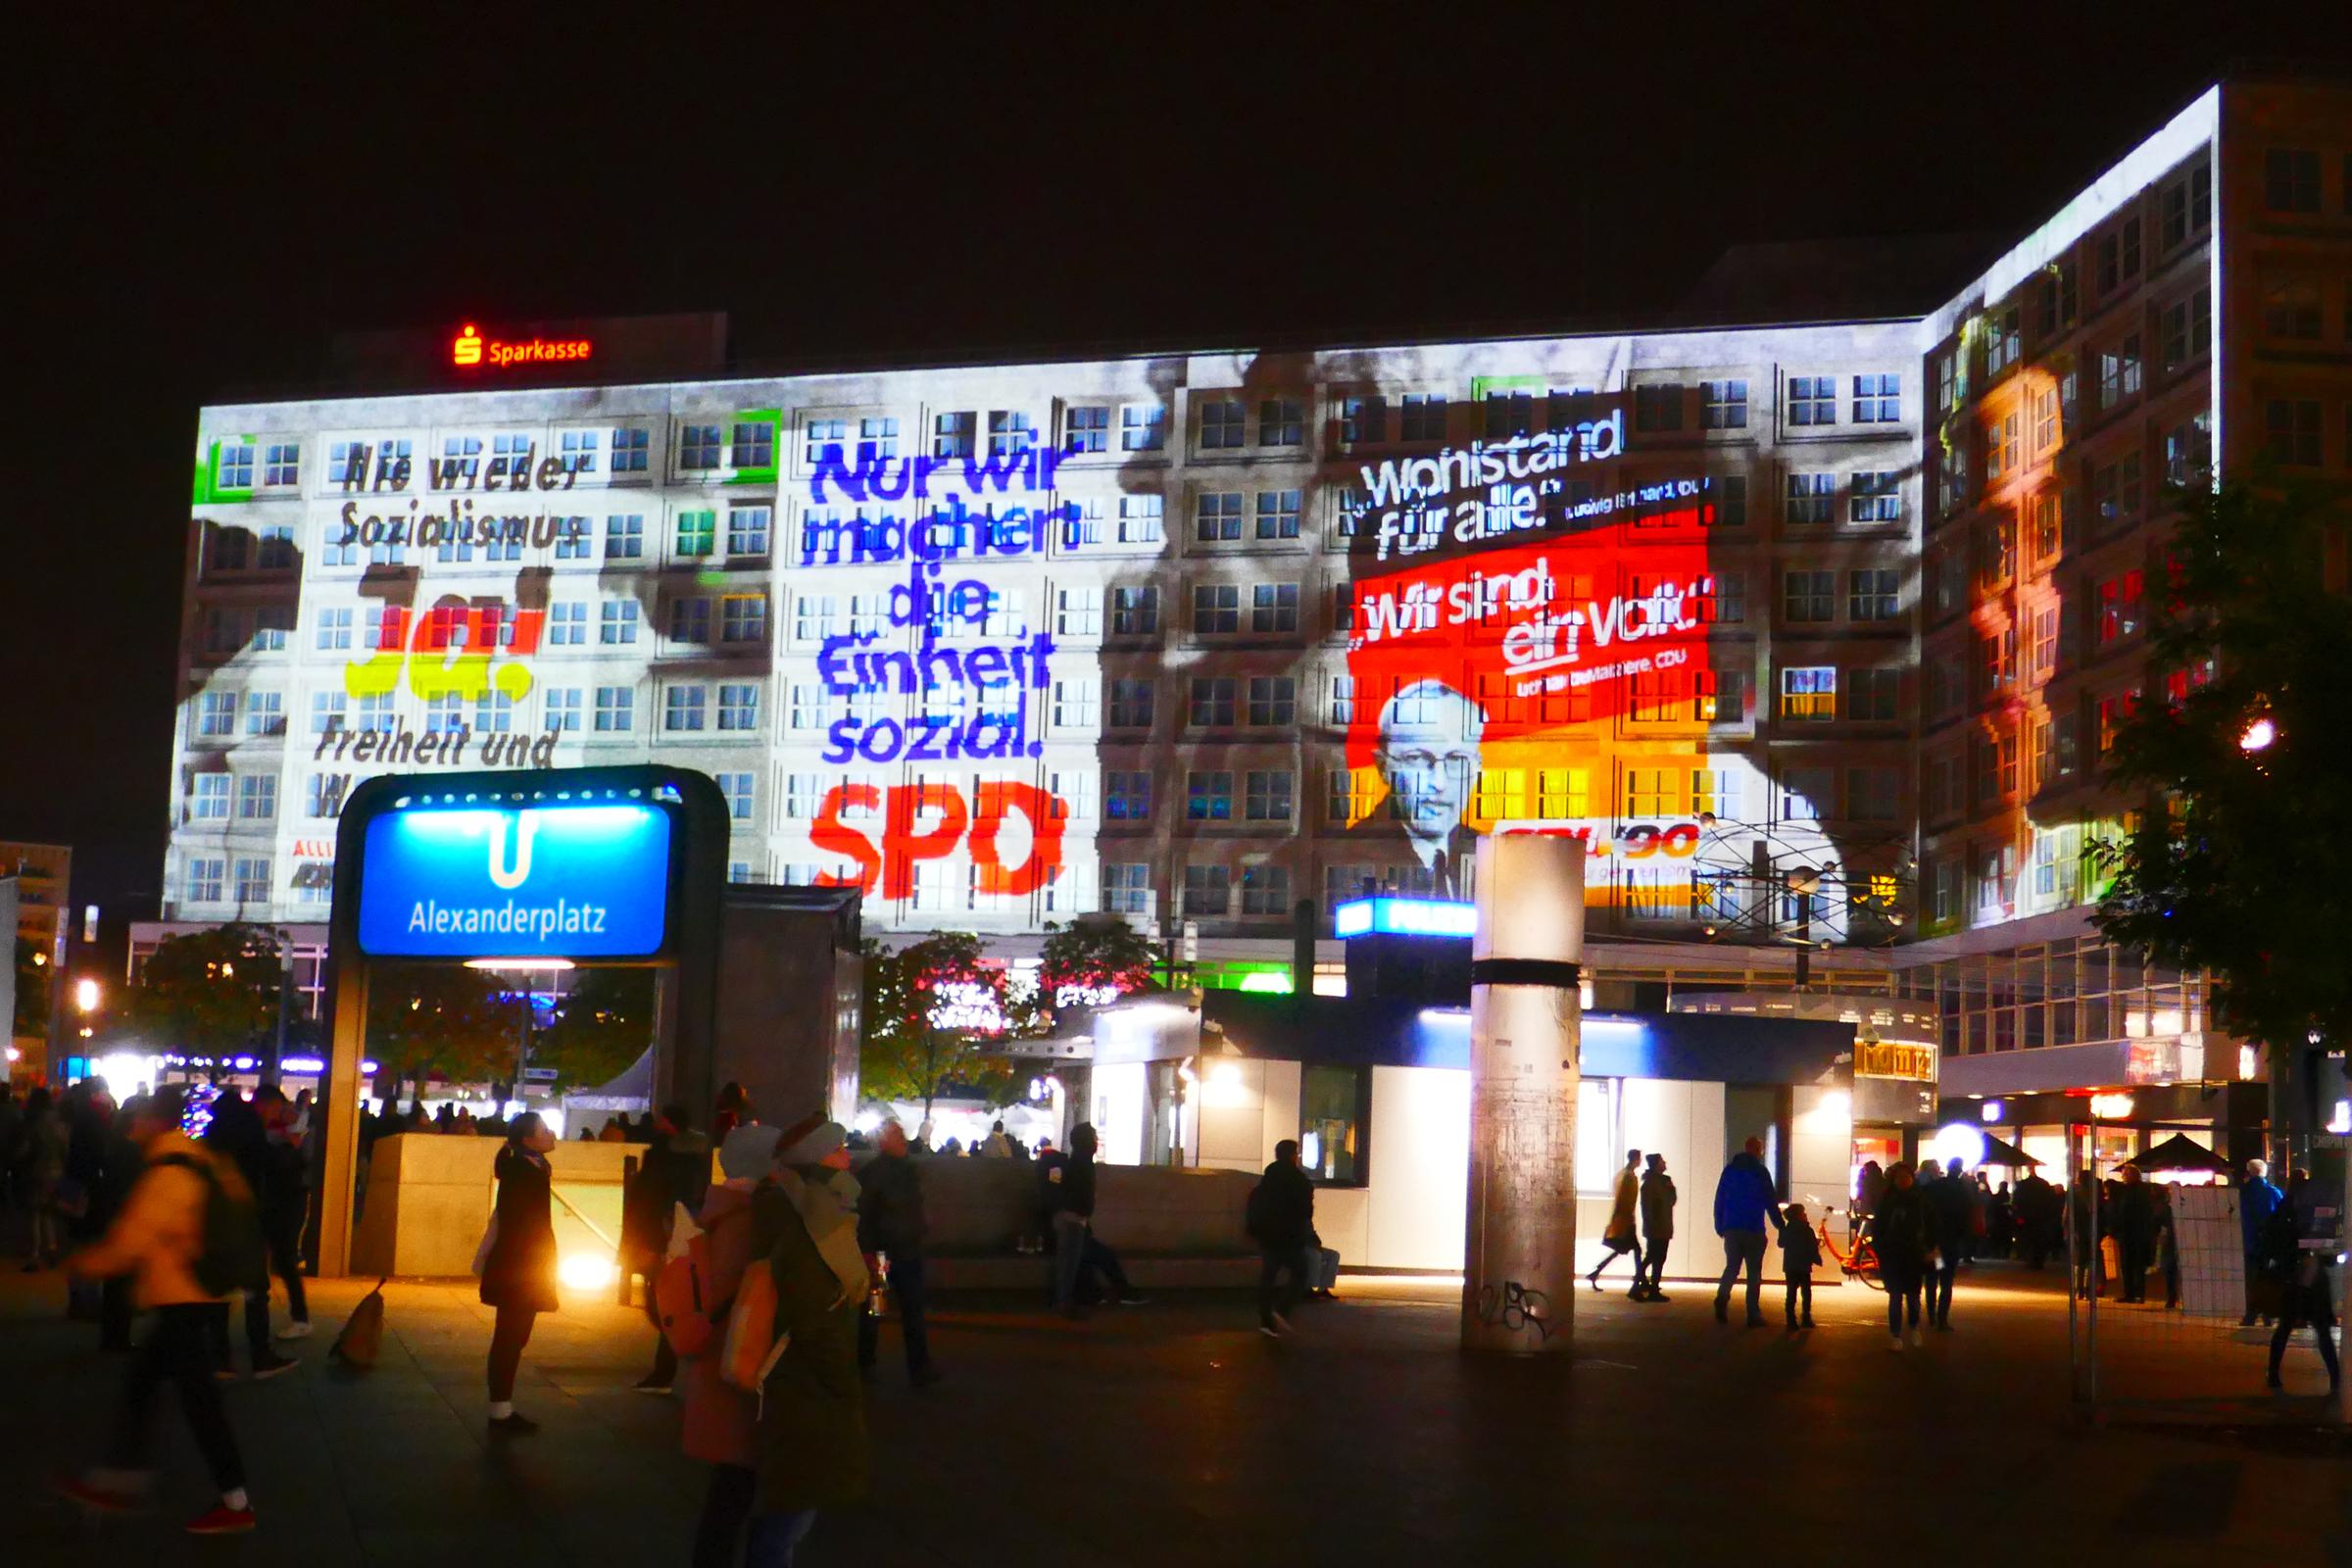 Alexanderplatz, Projektion